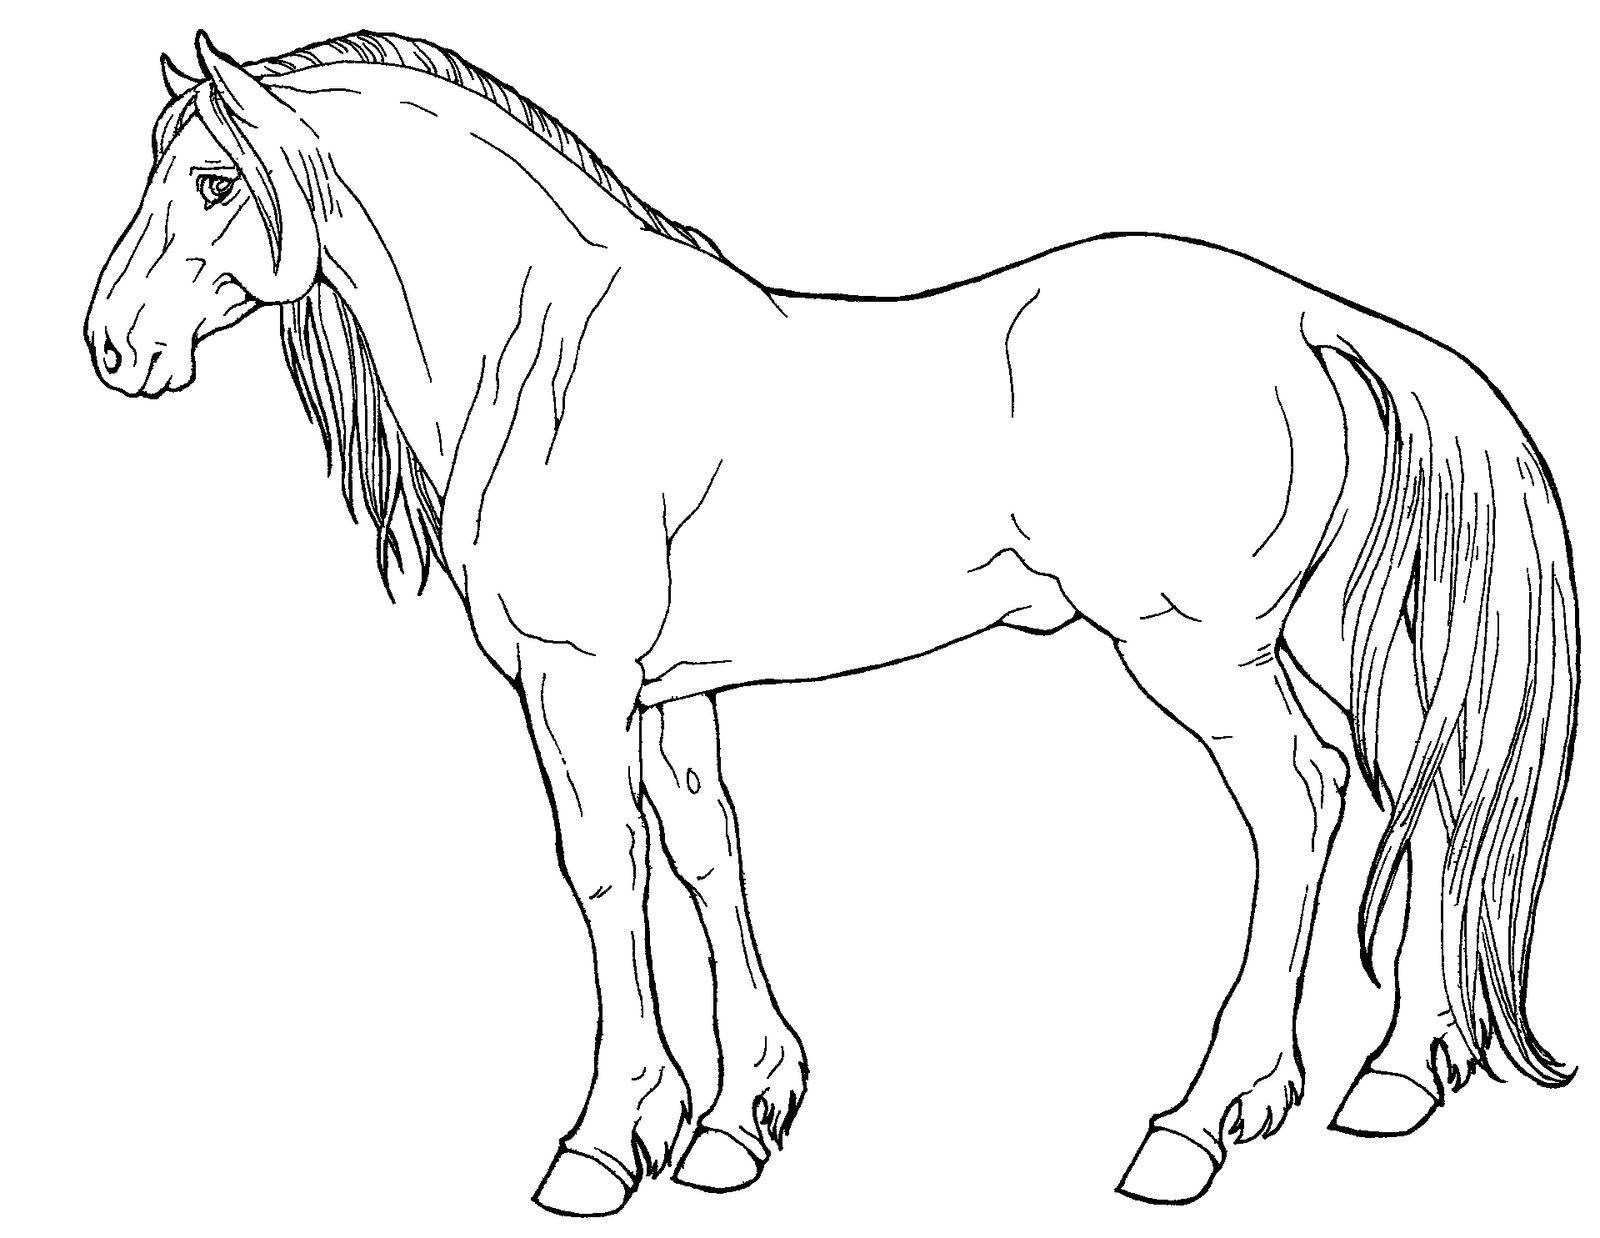 Free Line Art Mustang By Applehunter On Deviantart Line Art Art Kids Colouring Printables [ 1238 x 1600 Pixel ]